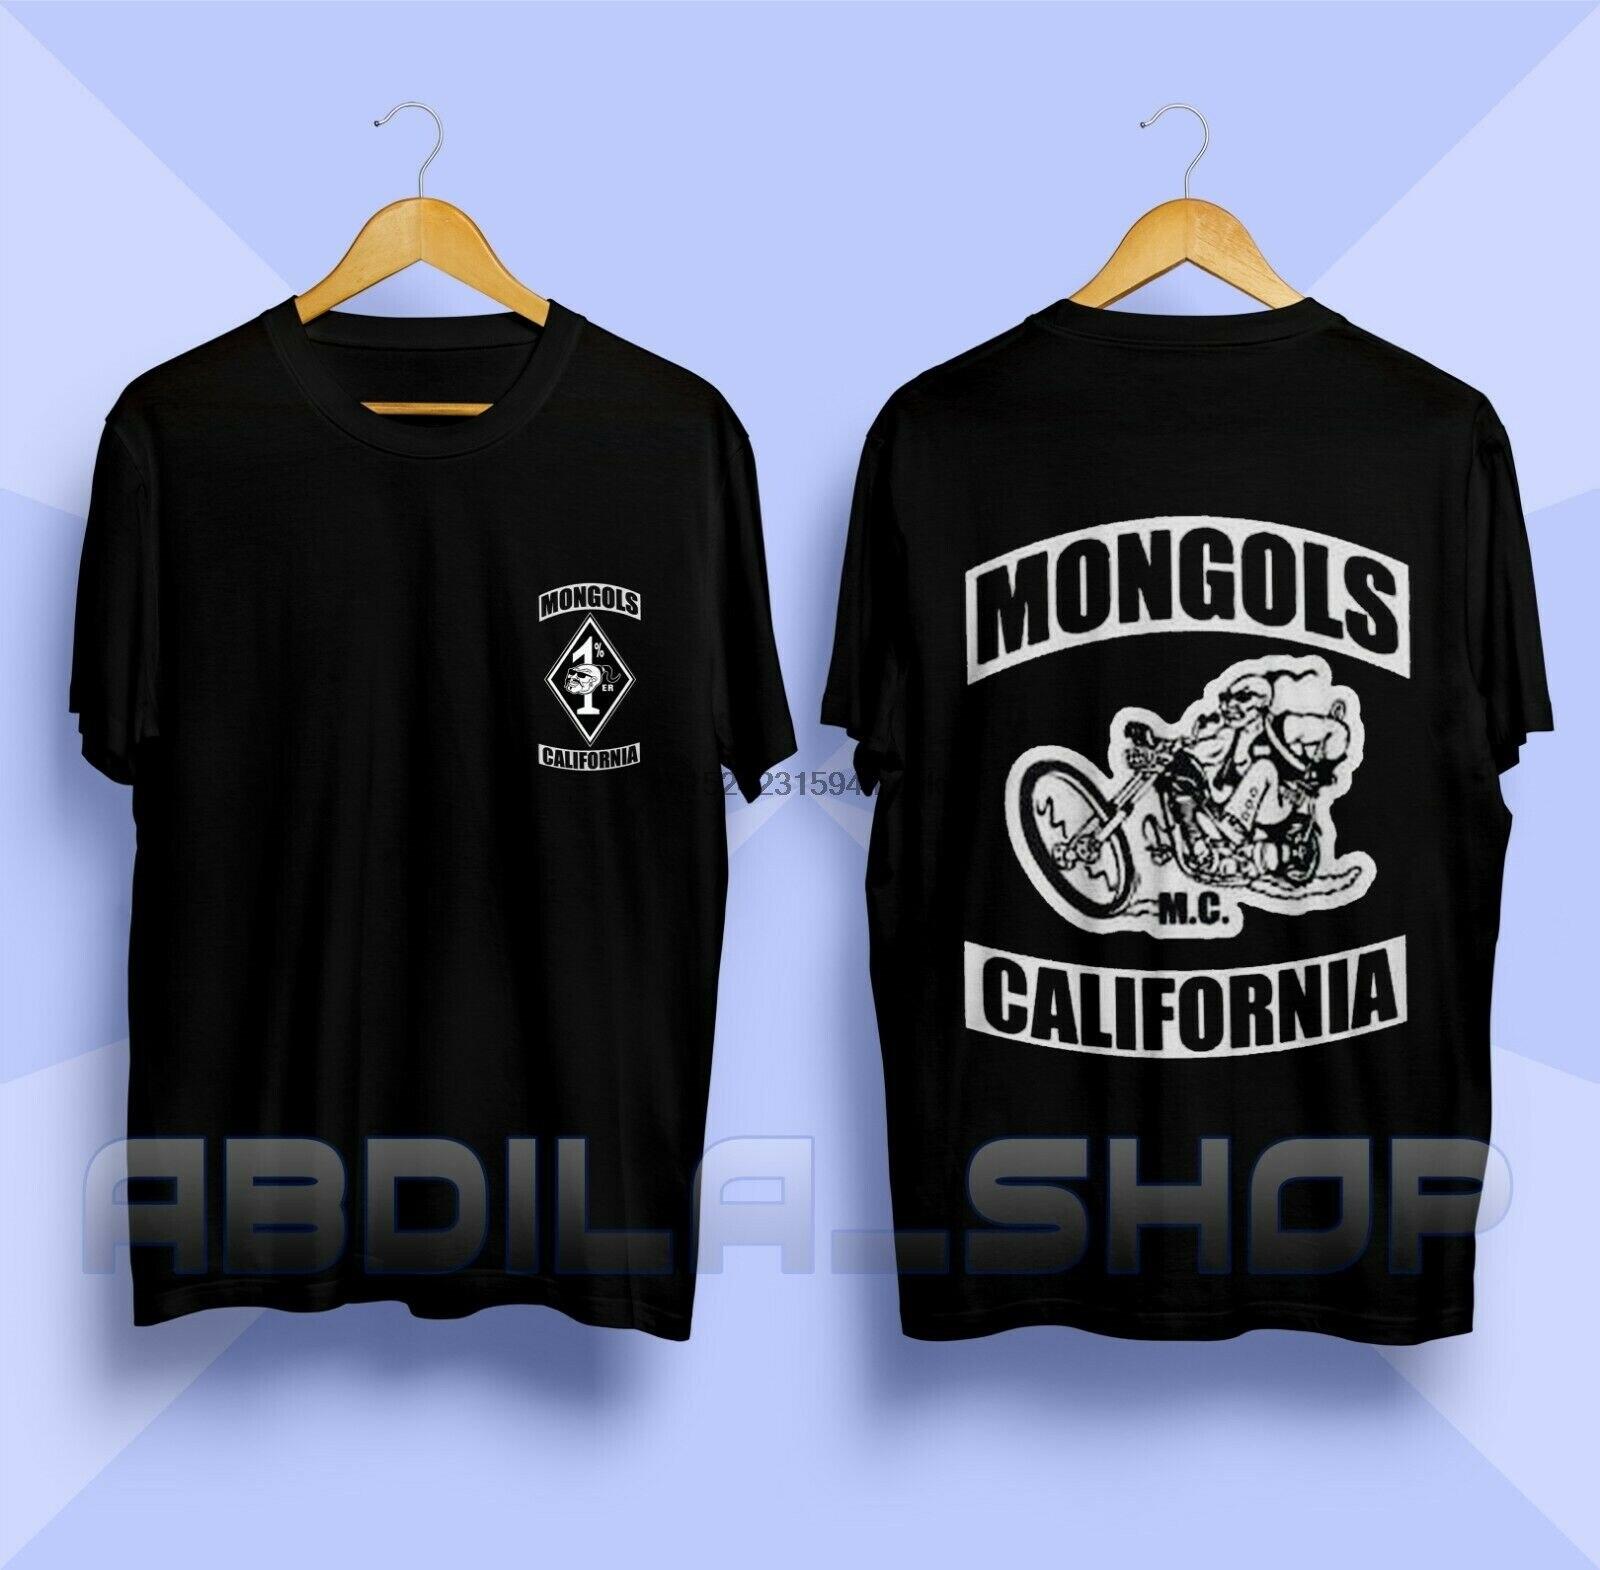 MONGOLS MC California Австралия логотип мотоцикл клуб Футболка Черный Размер S-3XL